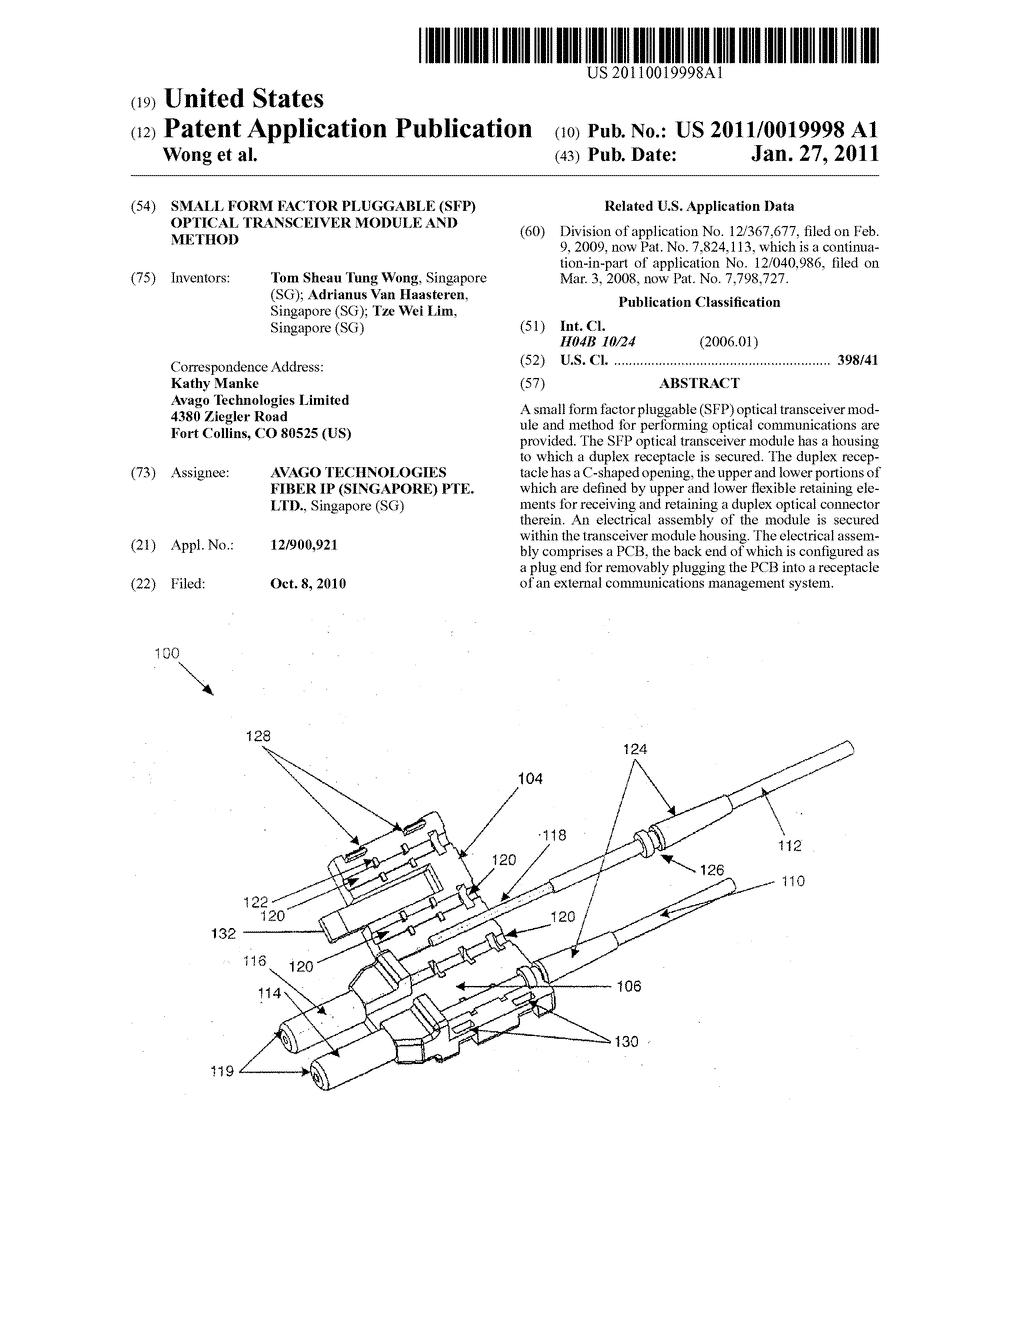 Sfp Small Form Factor Pluggable Optical Transceiver Module